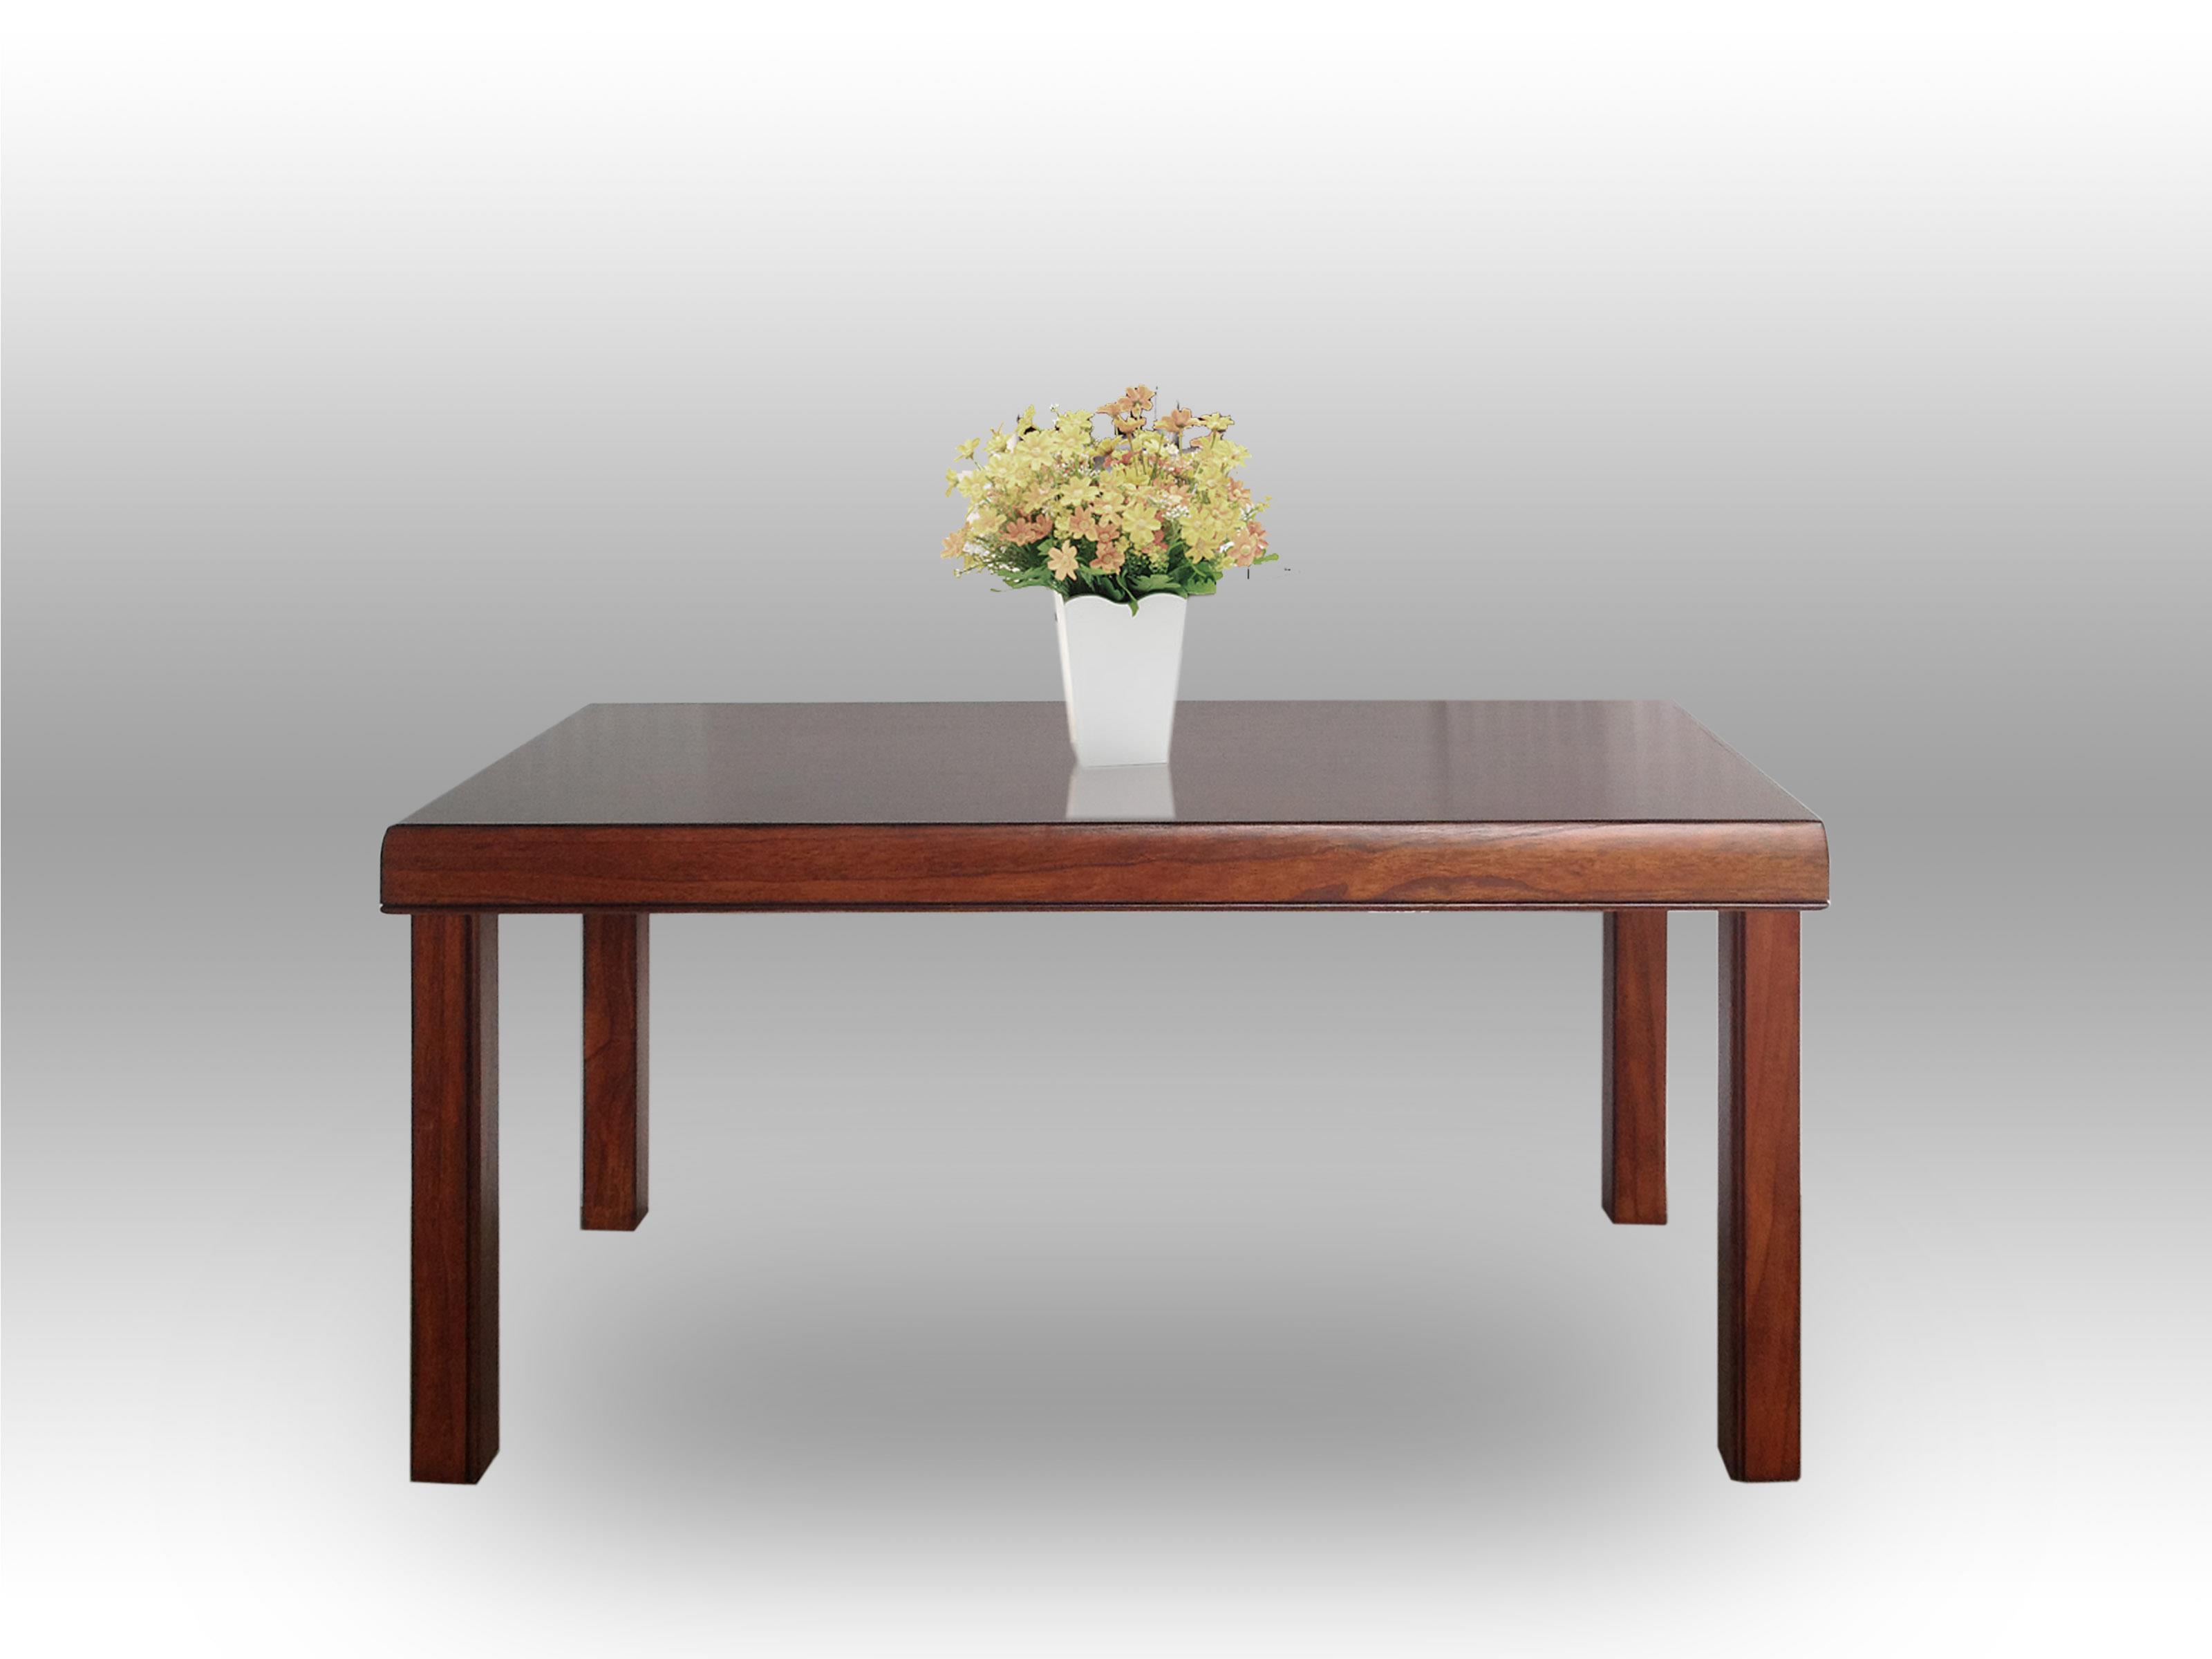 Morris Home Furnishings Calvert Calvert Leg Desk - Item Number: 834798507